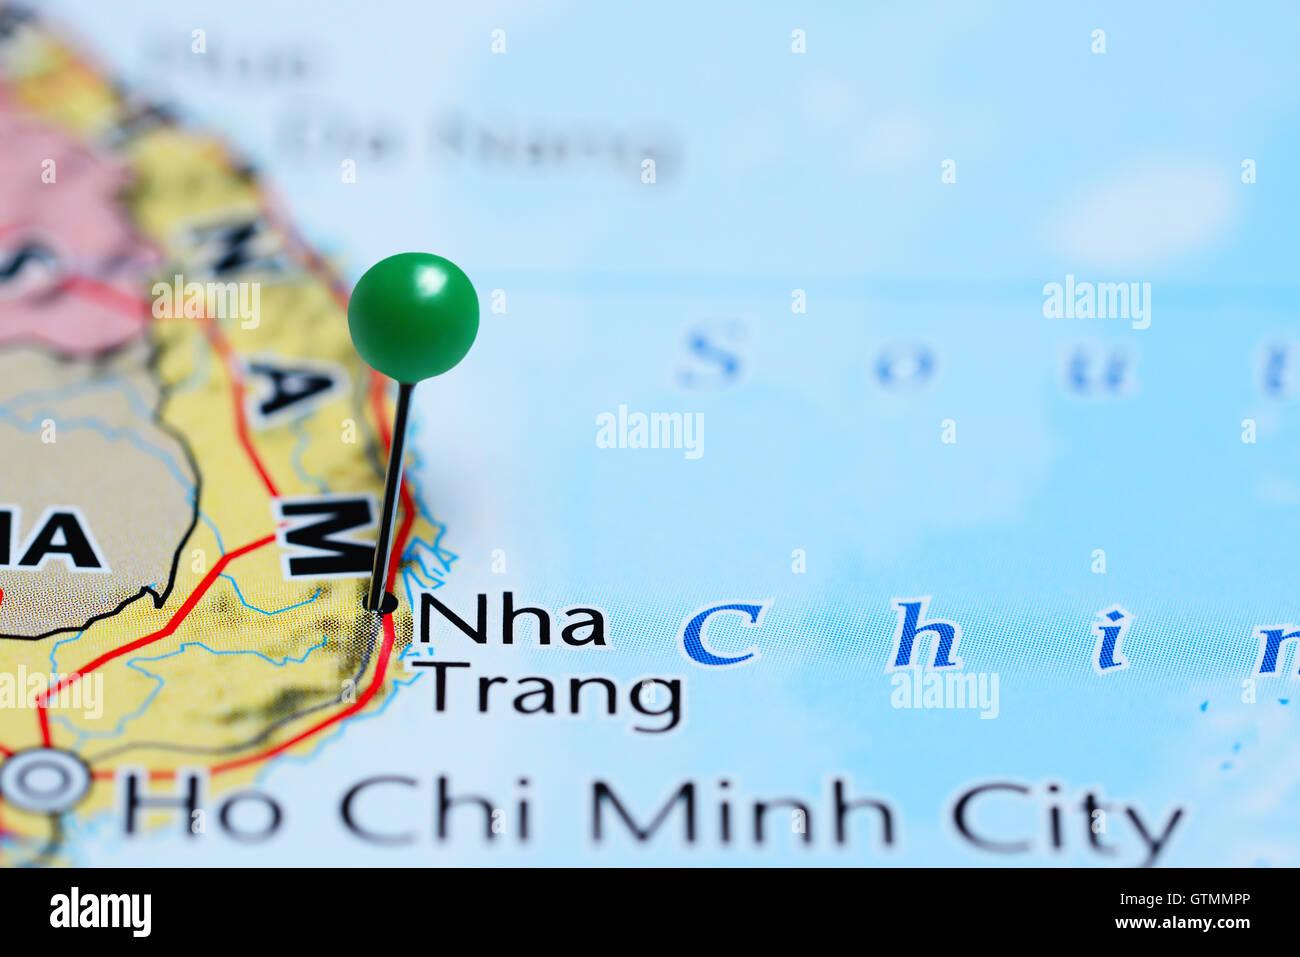 Nha Trang Vietnam Map.Nha Trang Pinned On A Map Of Vietnam Stock Photo 118469310 Alamy